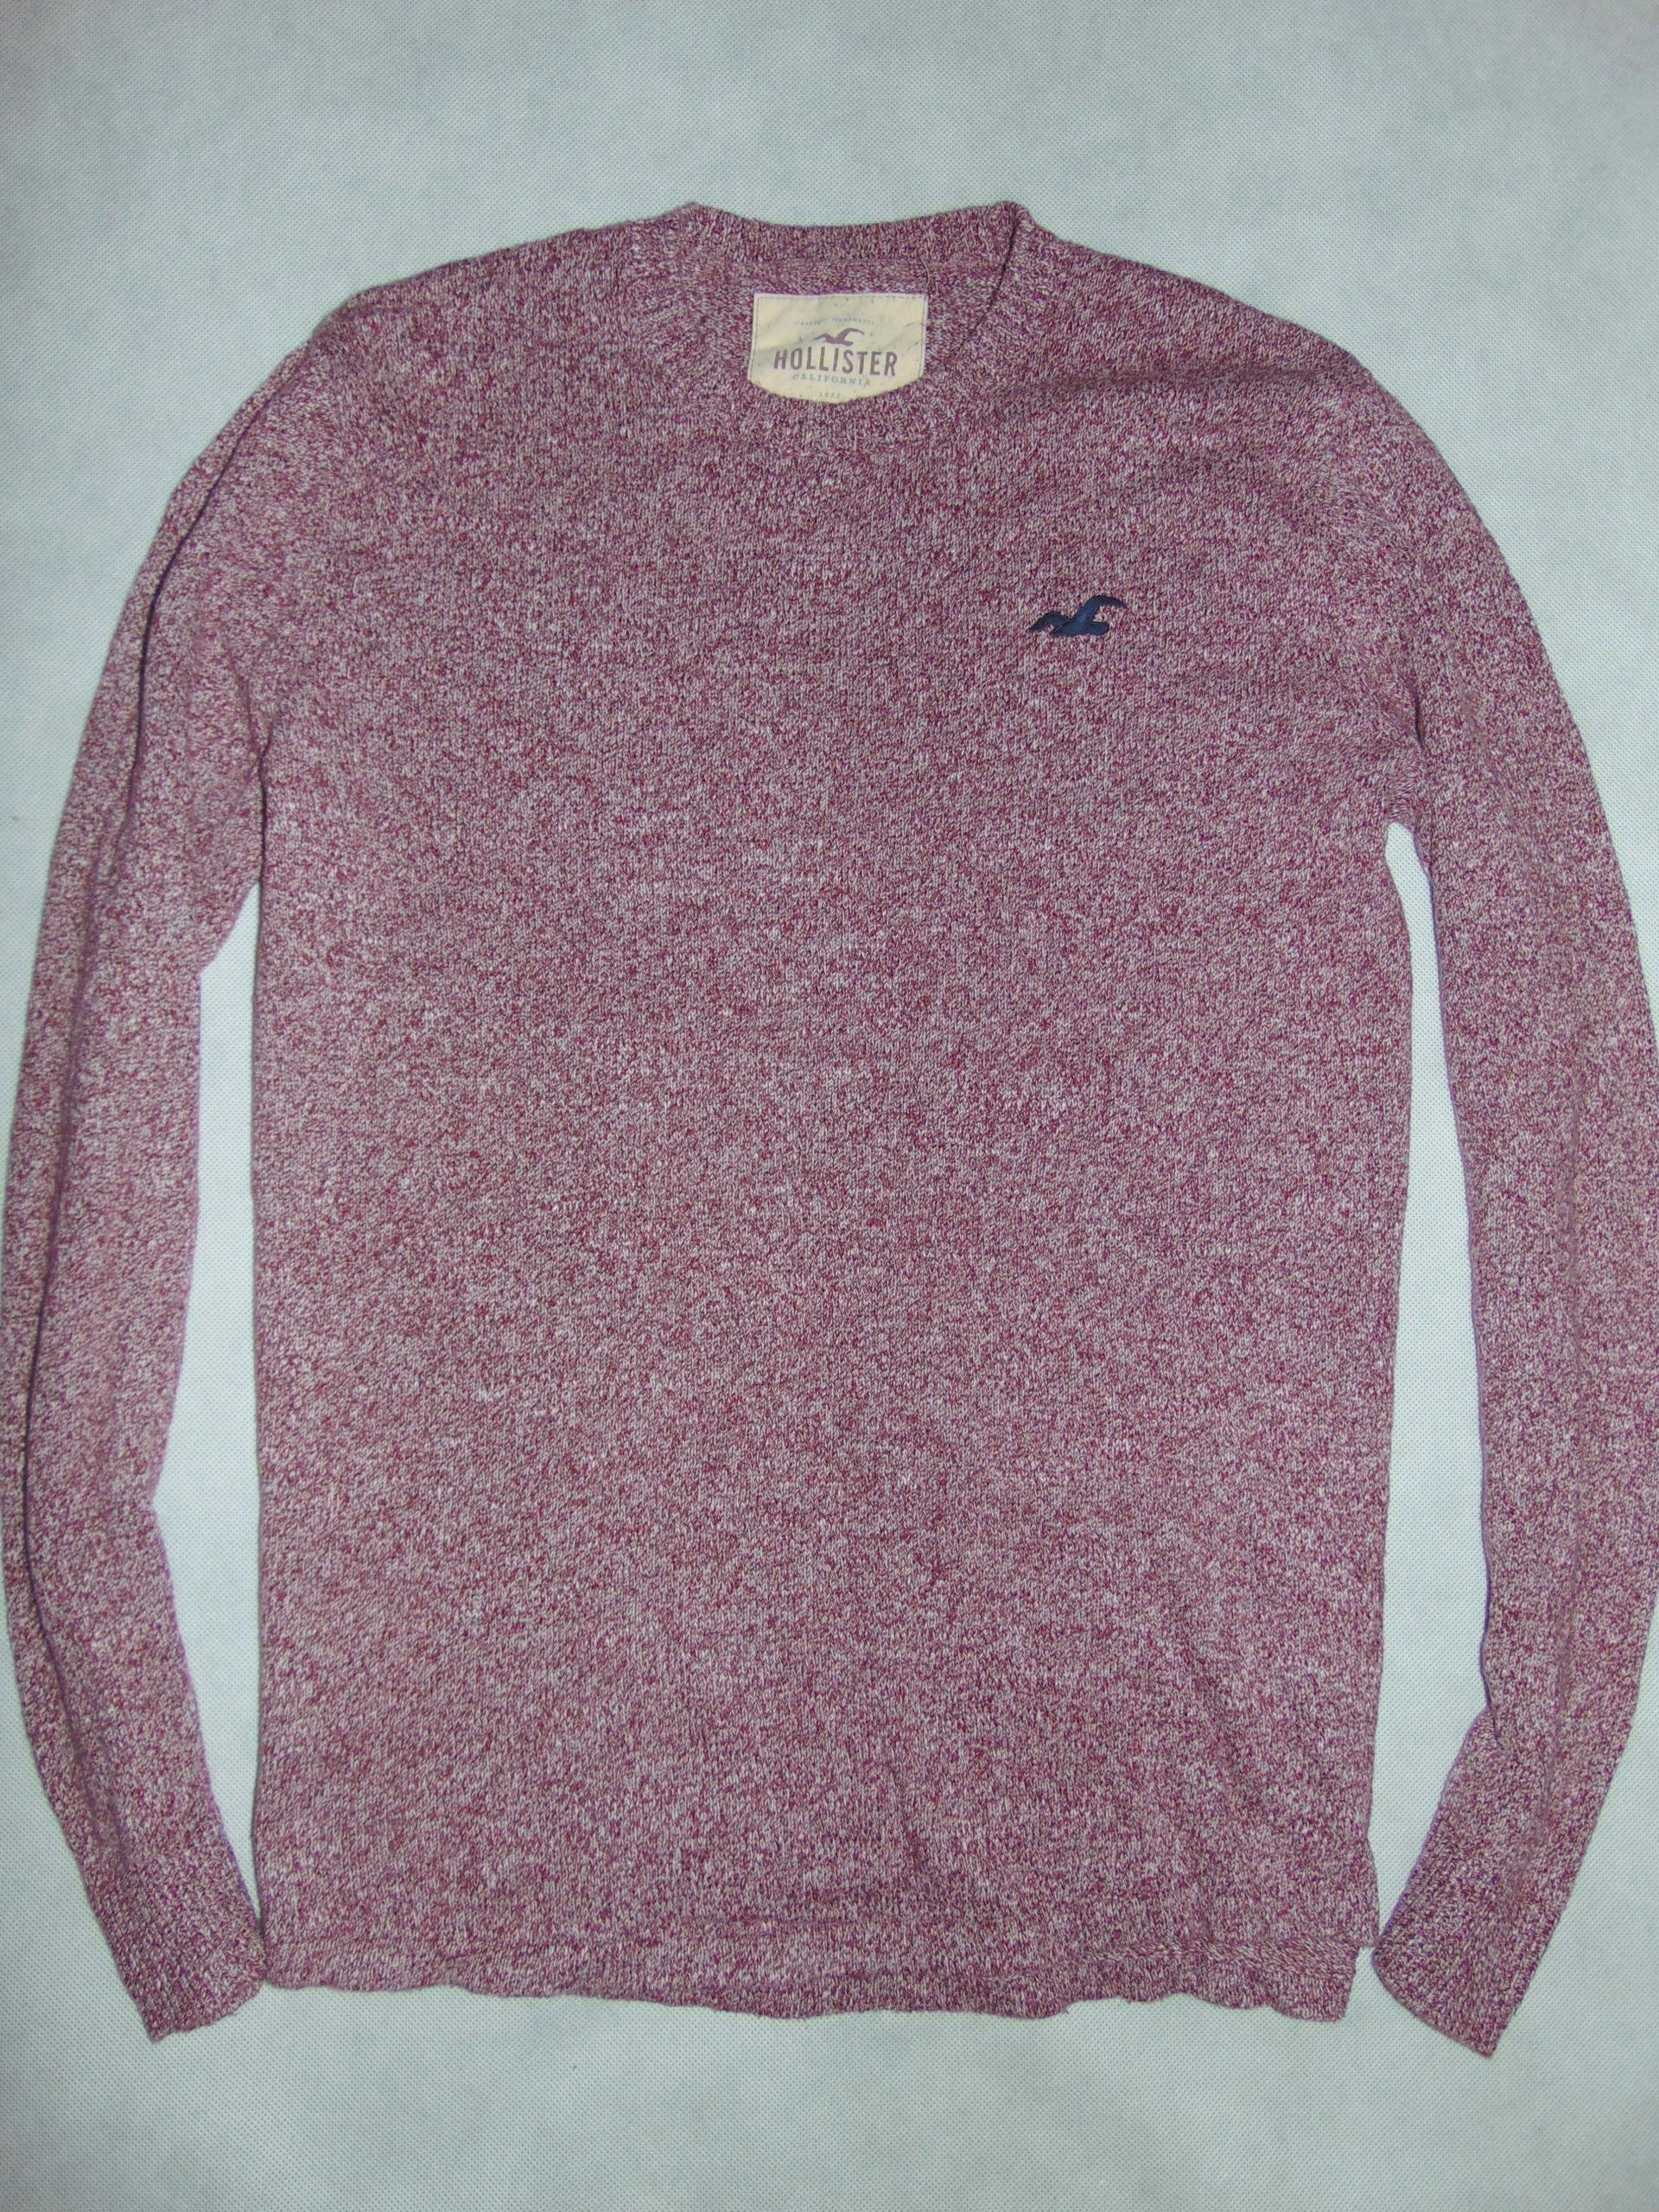 HOLLISTER sweterek męski r M ok 178 cm